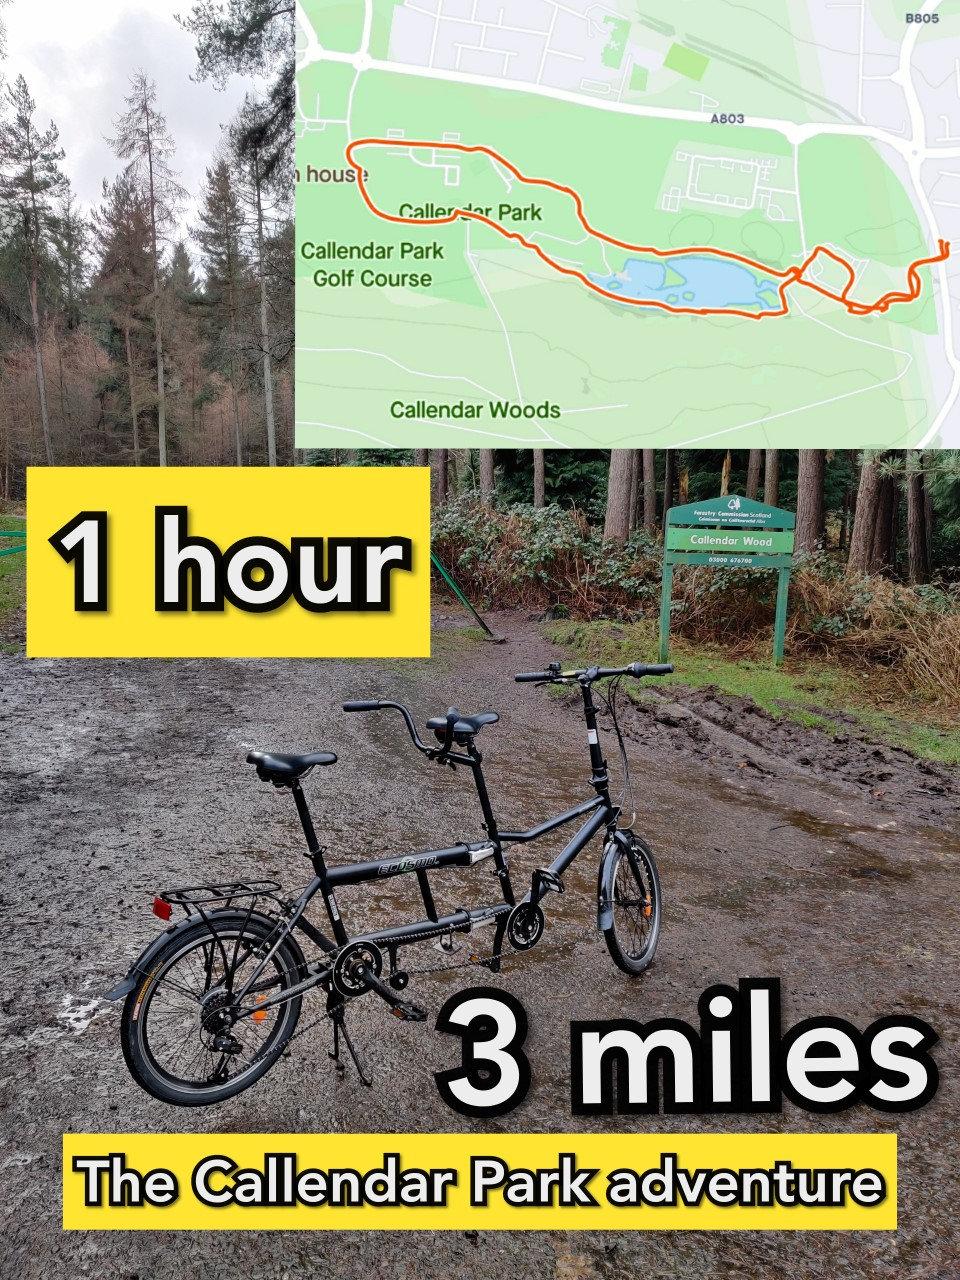 Tandem bike hire - Mini Adventure